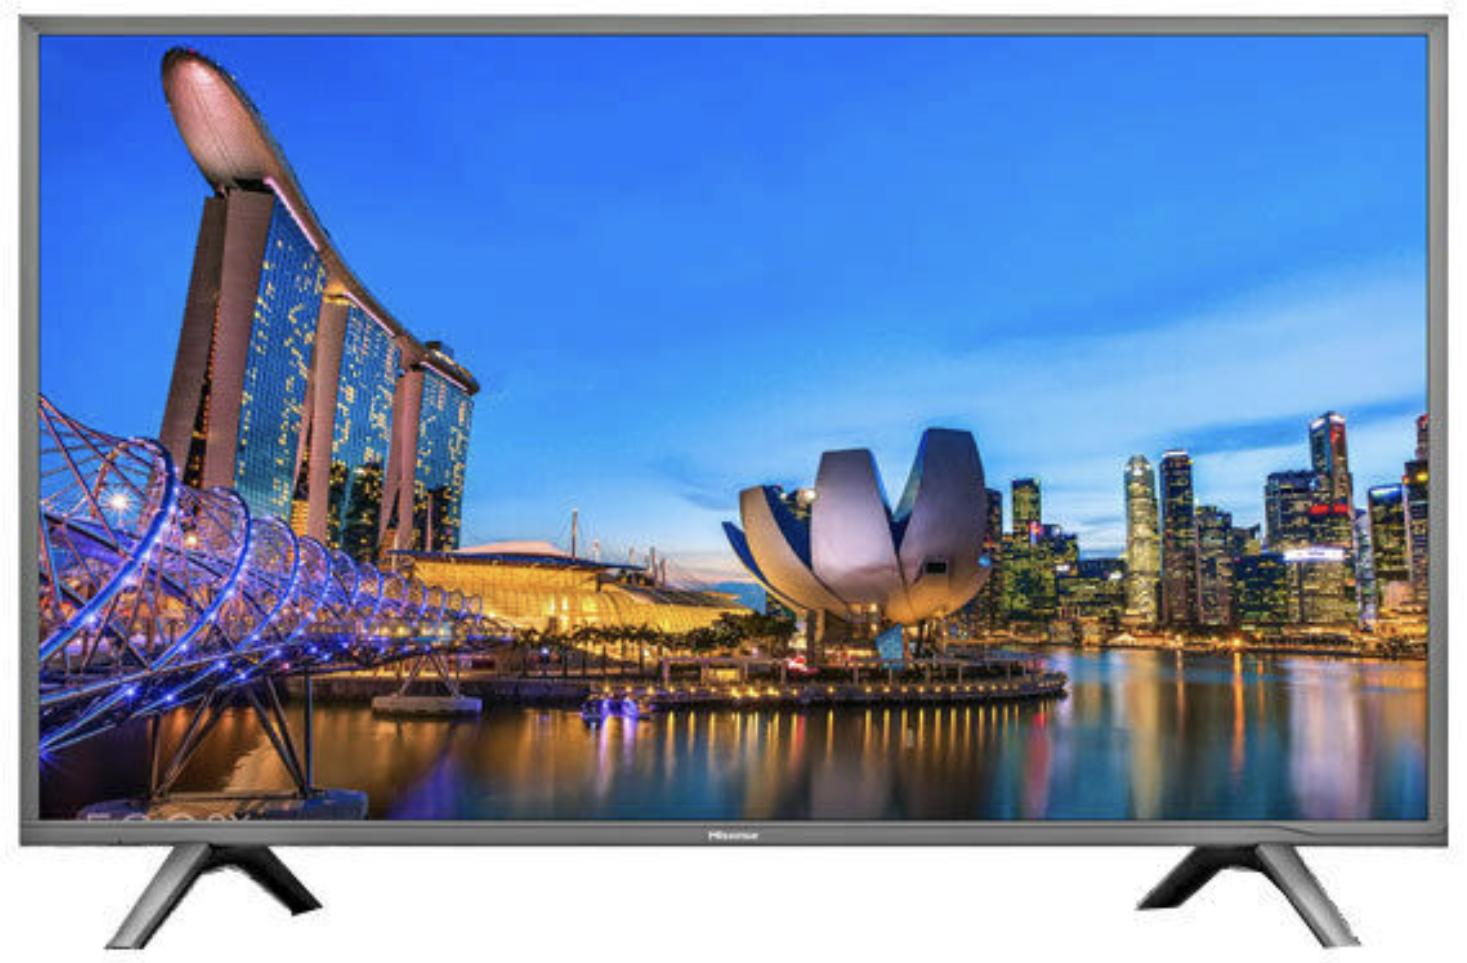 Hisense H49NEC5605 124cm 49 Zoll 4K Ultra HD Smart TV Triple Tuner für 346,31€ inkl. Versandkosten